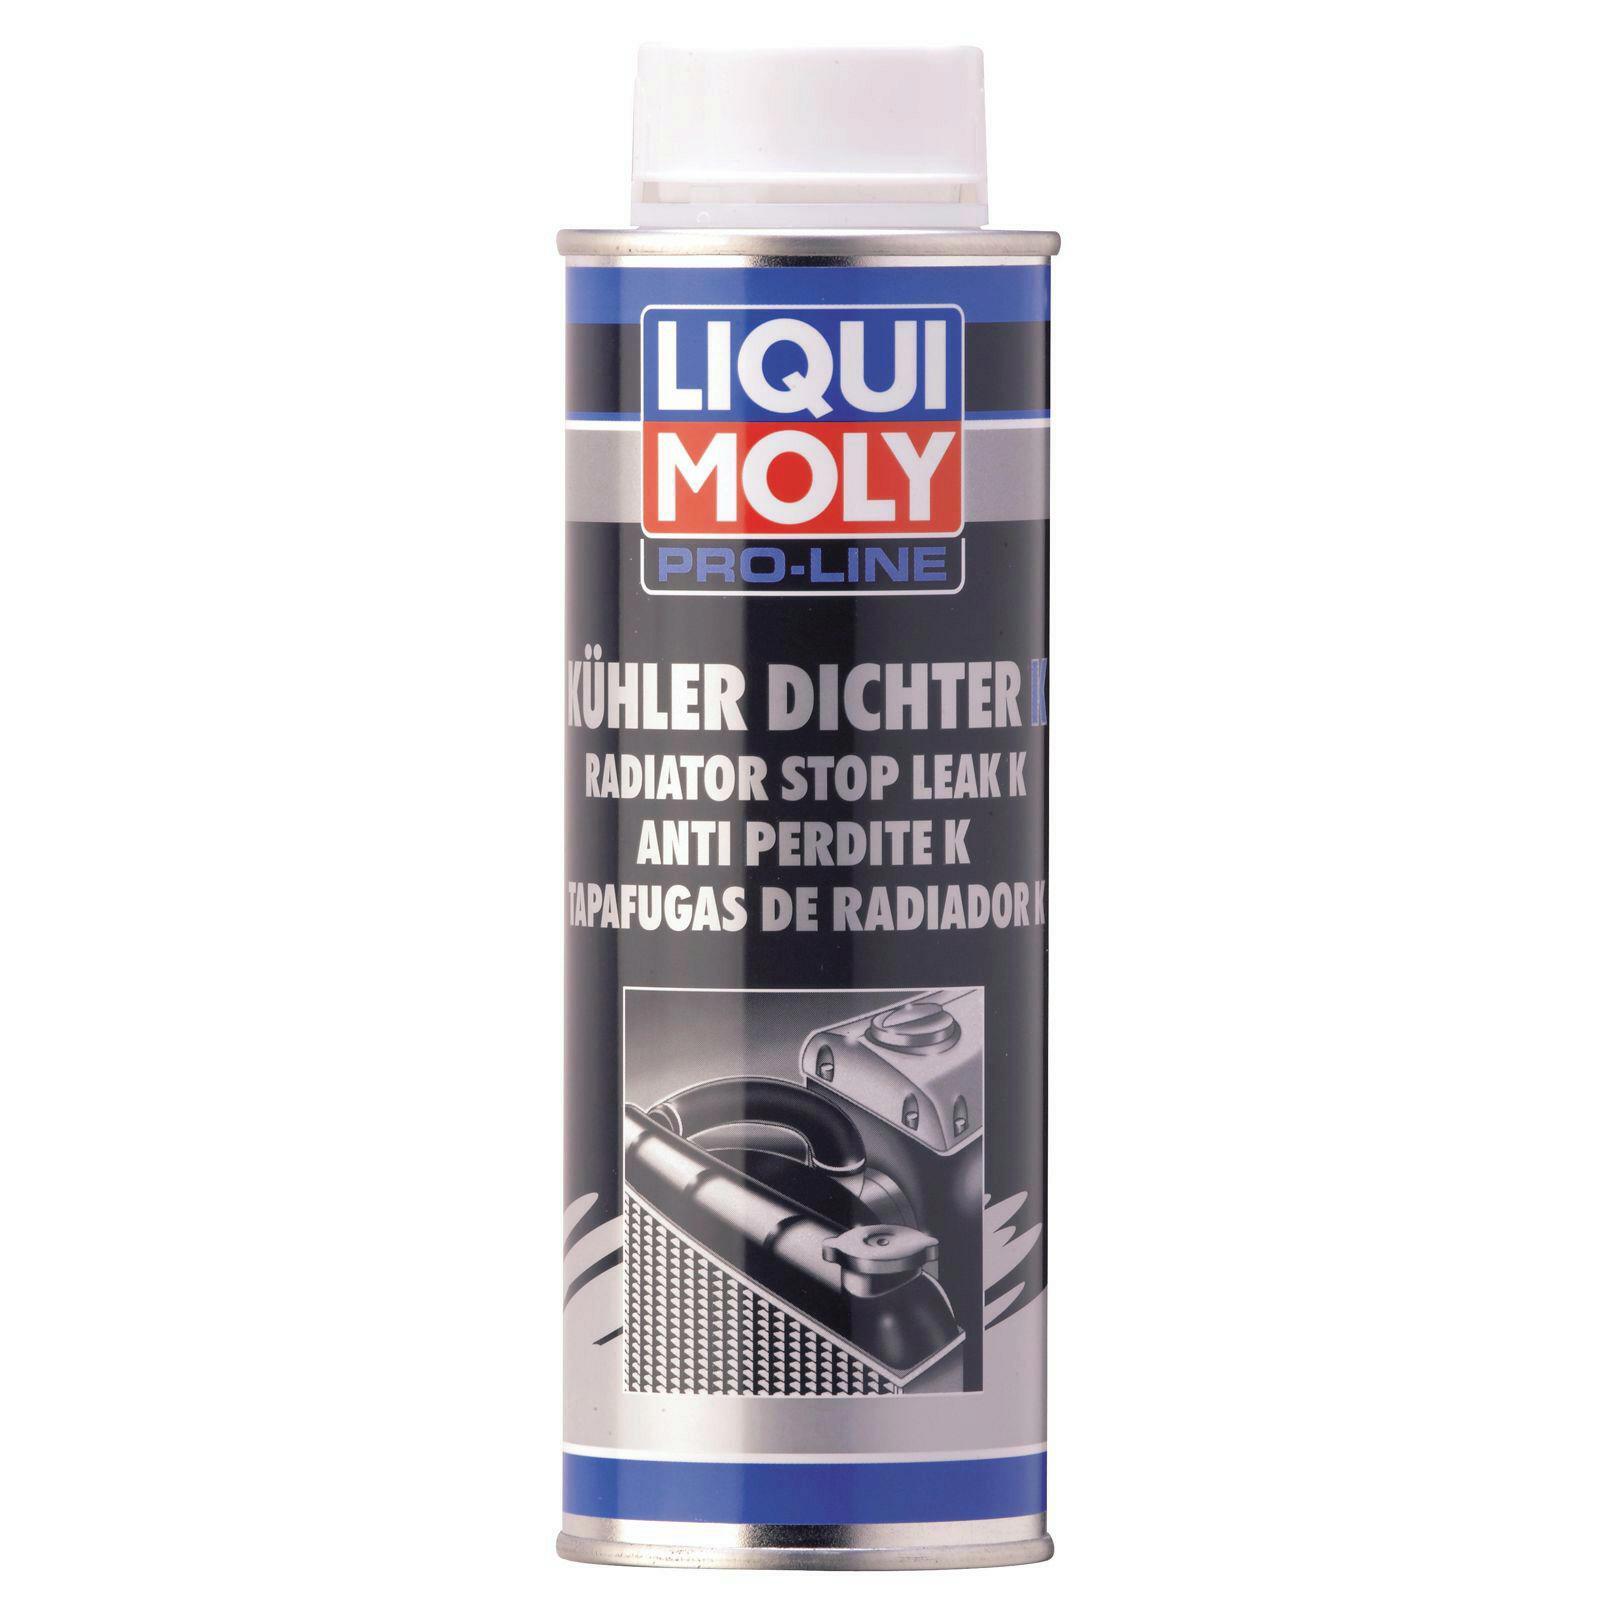 Liqui Moly Pro-Line Kähler-Dichter K 250ml